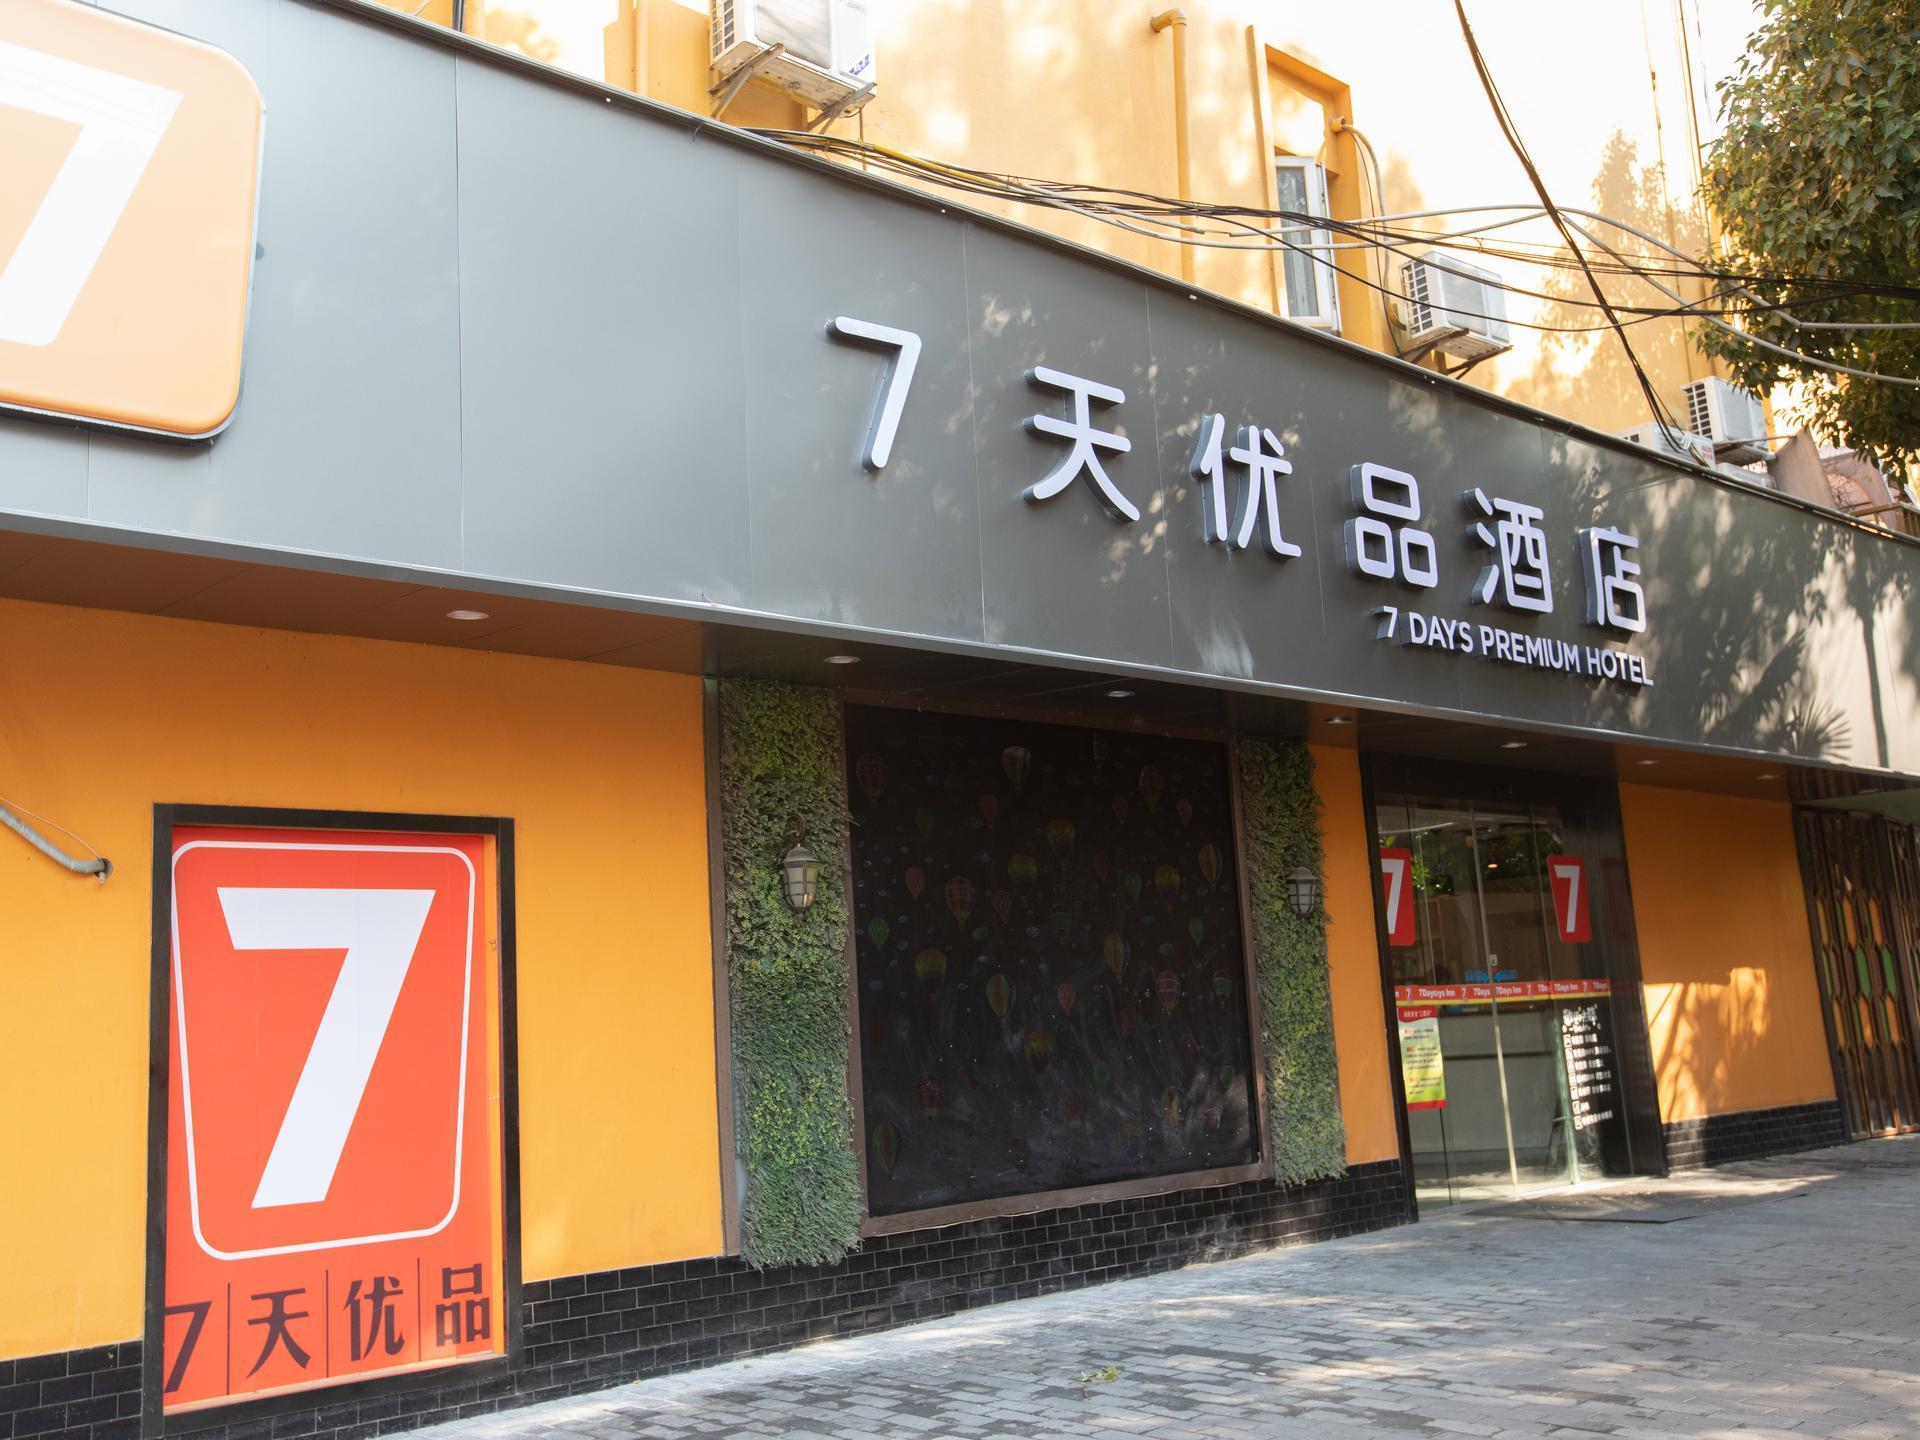 7 Days Premium Hotel Shanghai Xujiahui Longhua Road Metro station